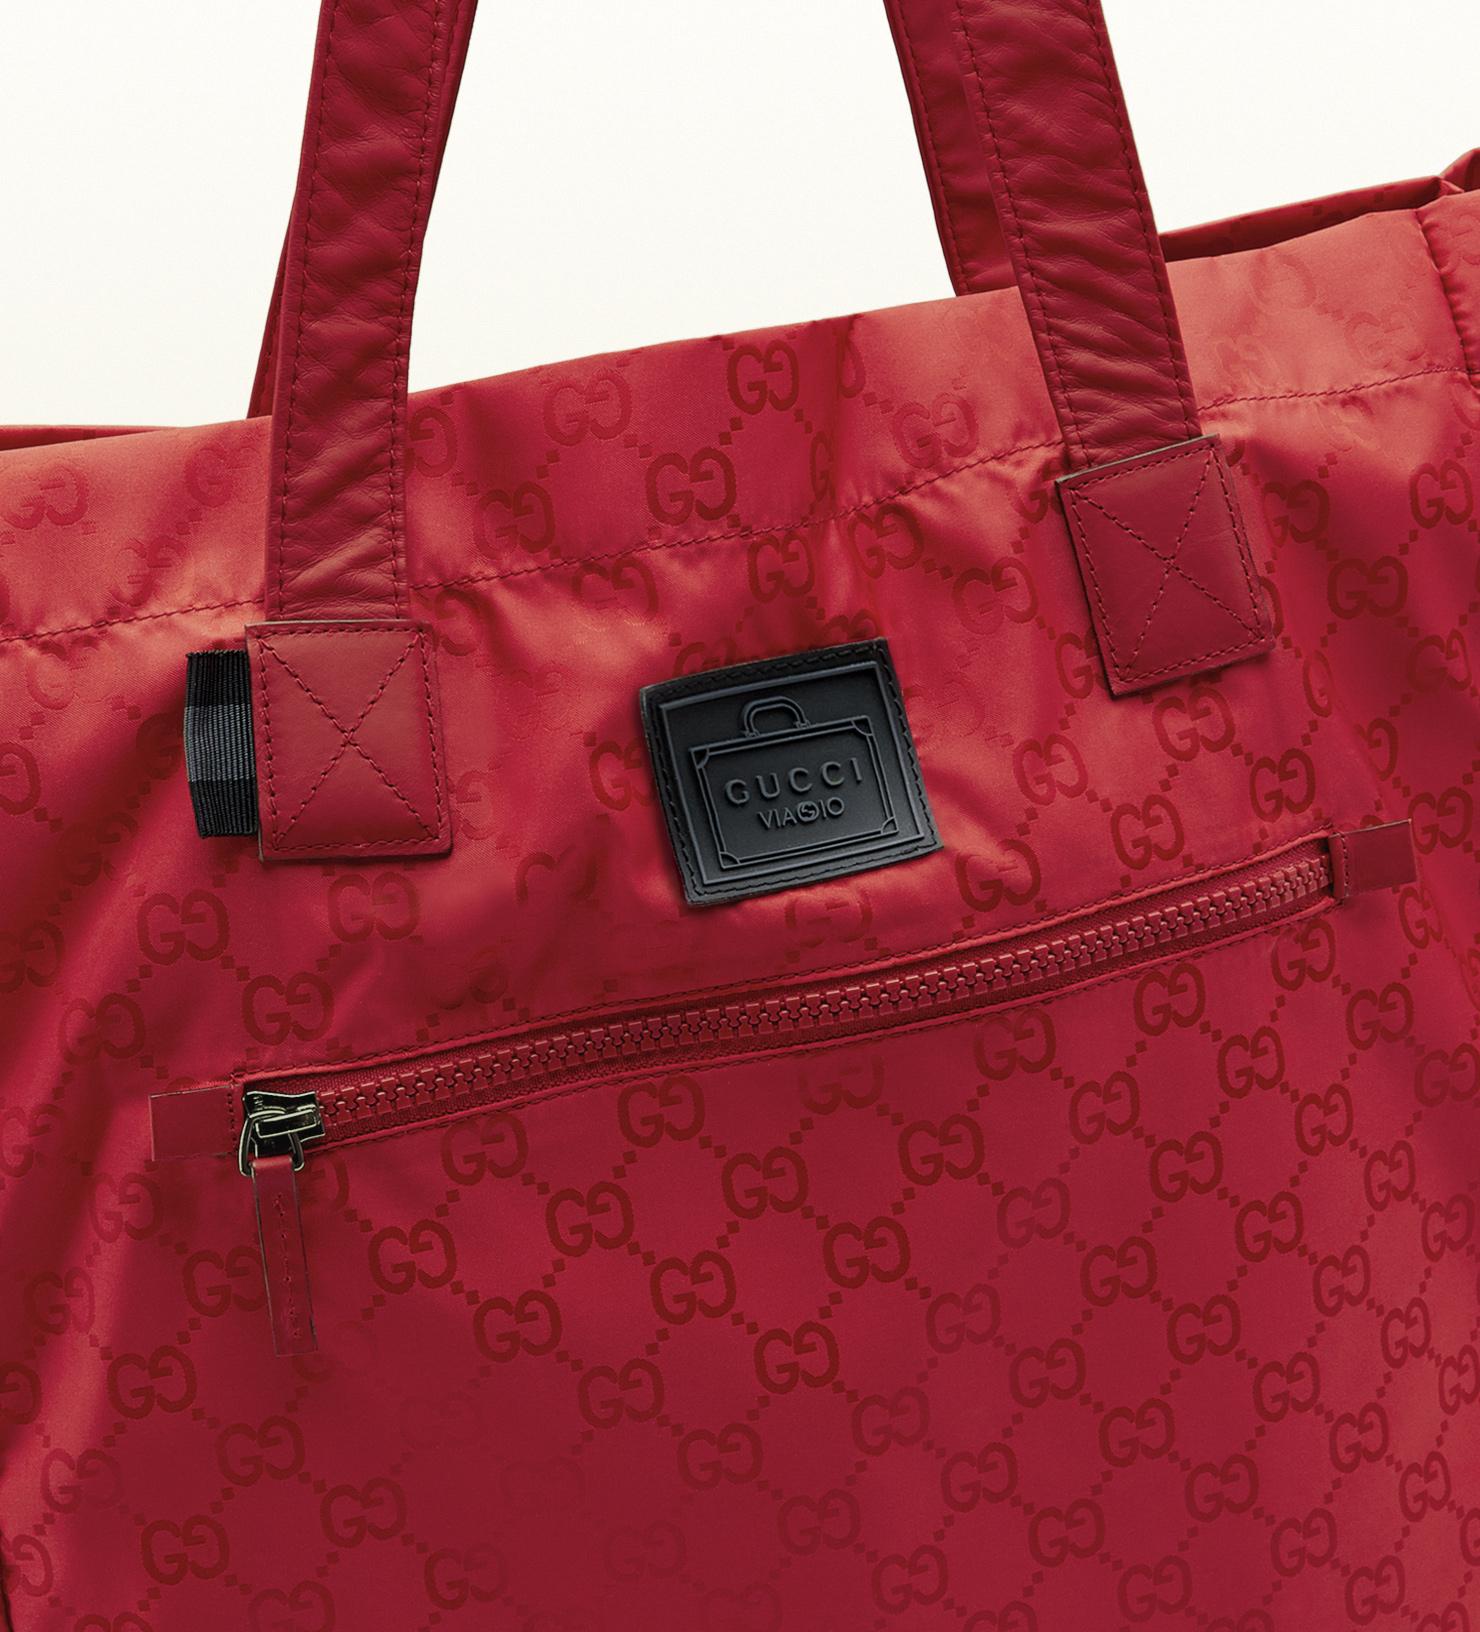 86b8945e3a5b Gucci Gg Nylon Tote From Viaggio Collection in Red for Men - Lyst